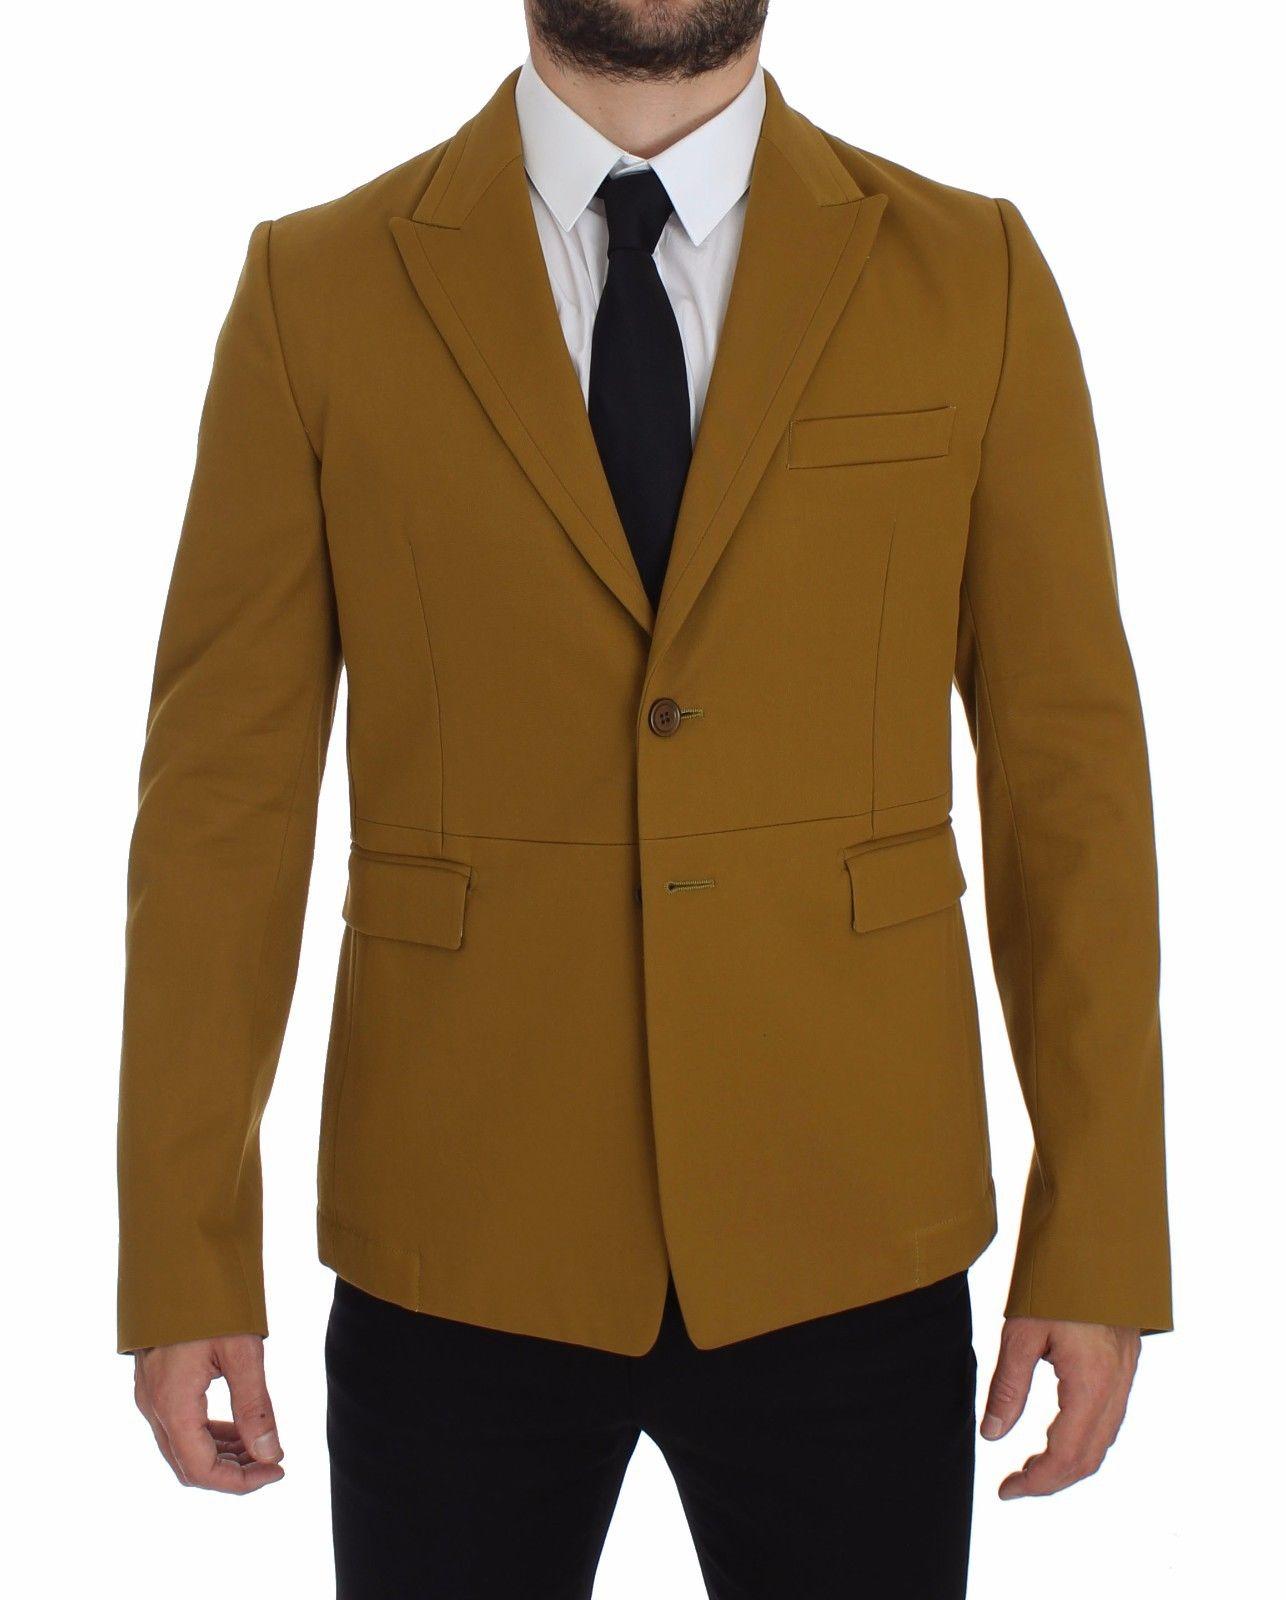 Dolce & Gabbana Men's Cotton Stretch Blazer Yellow GTT10103 - IT52 | XL